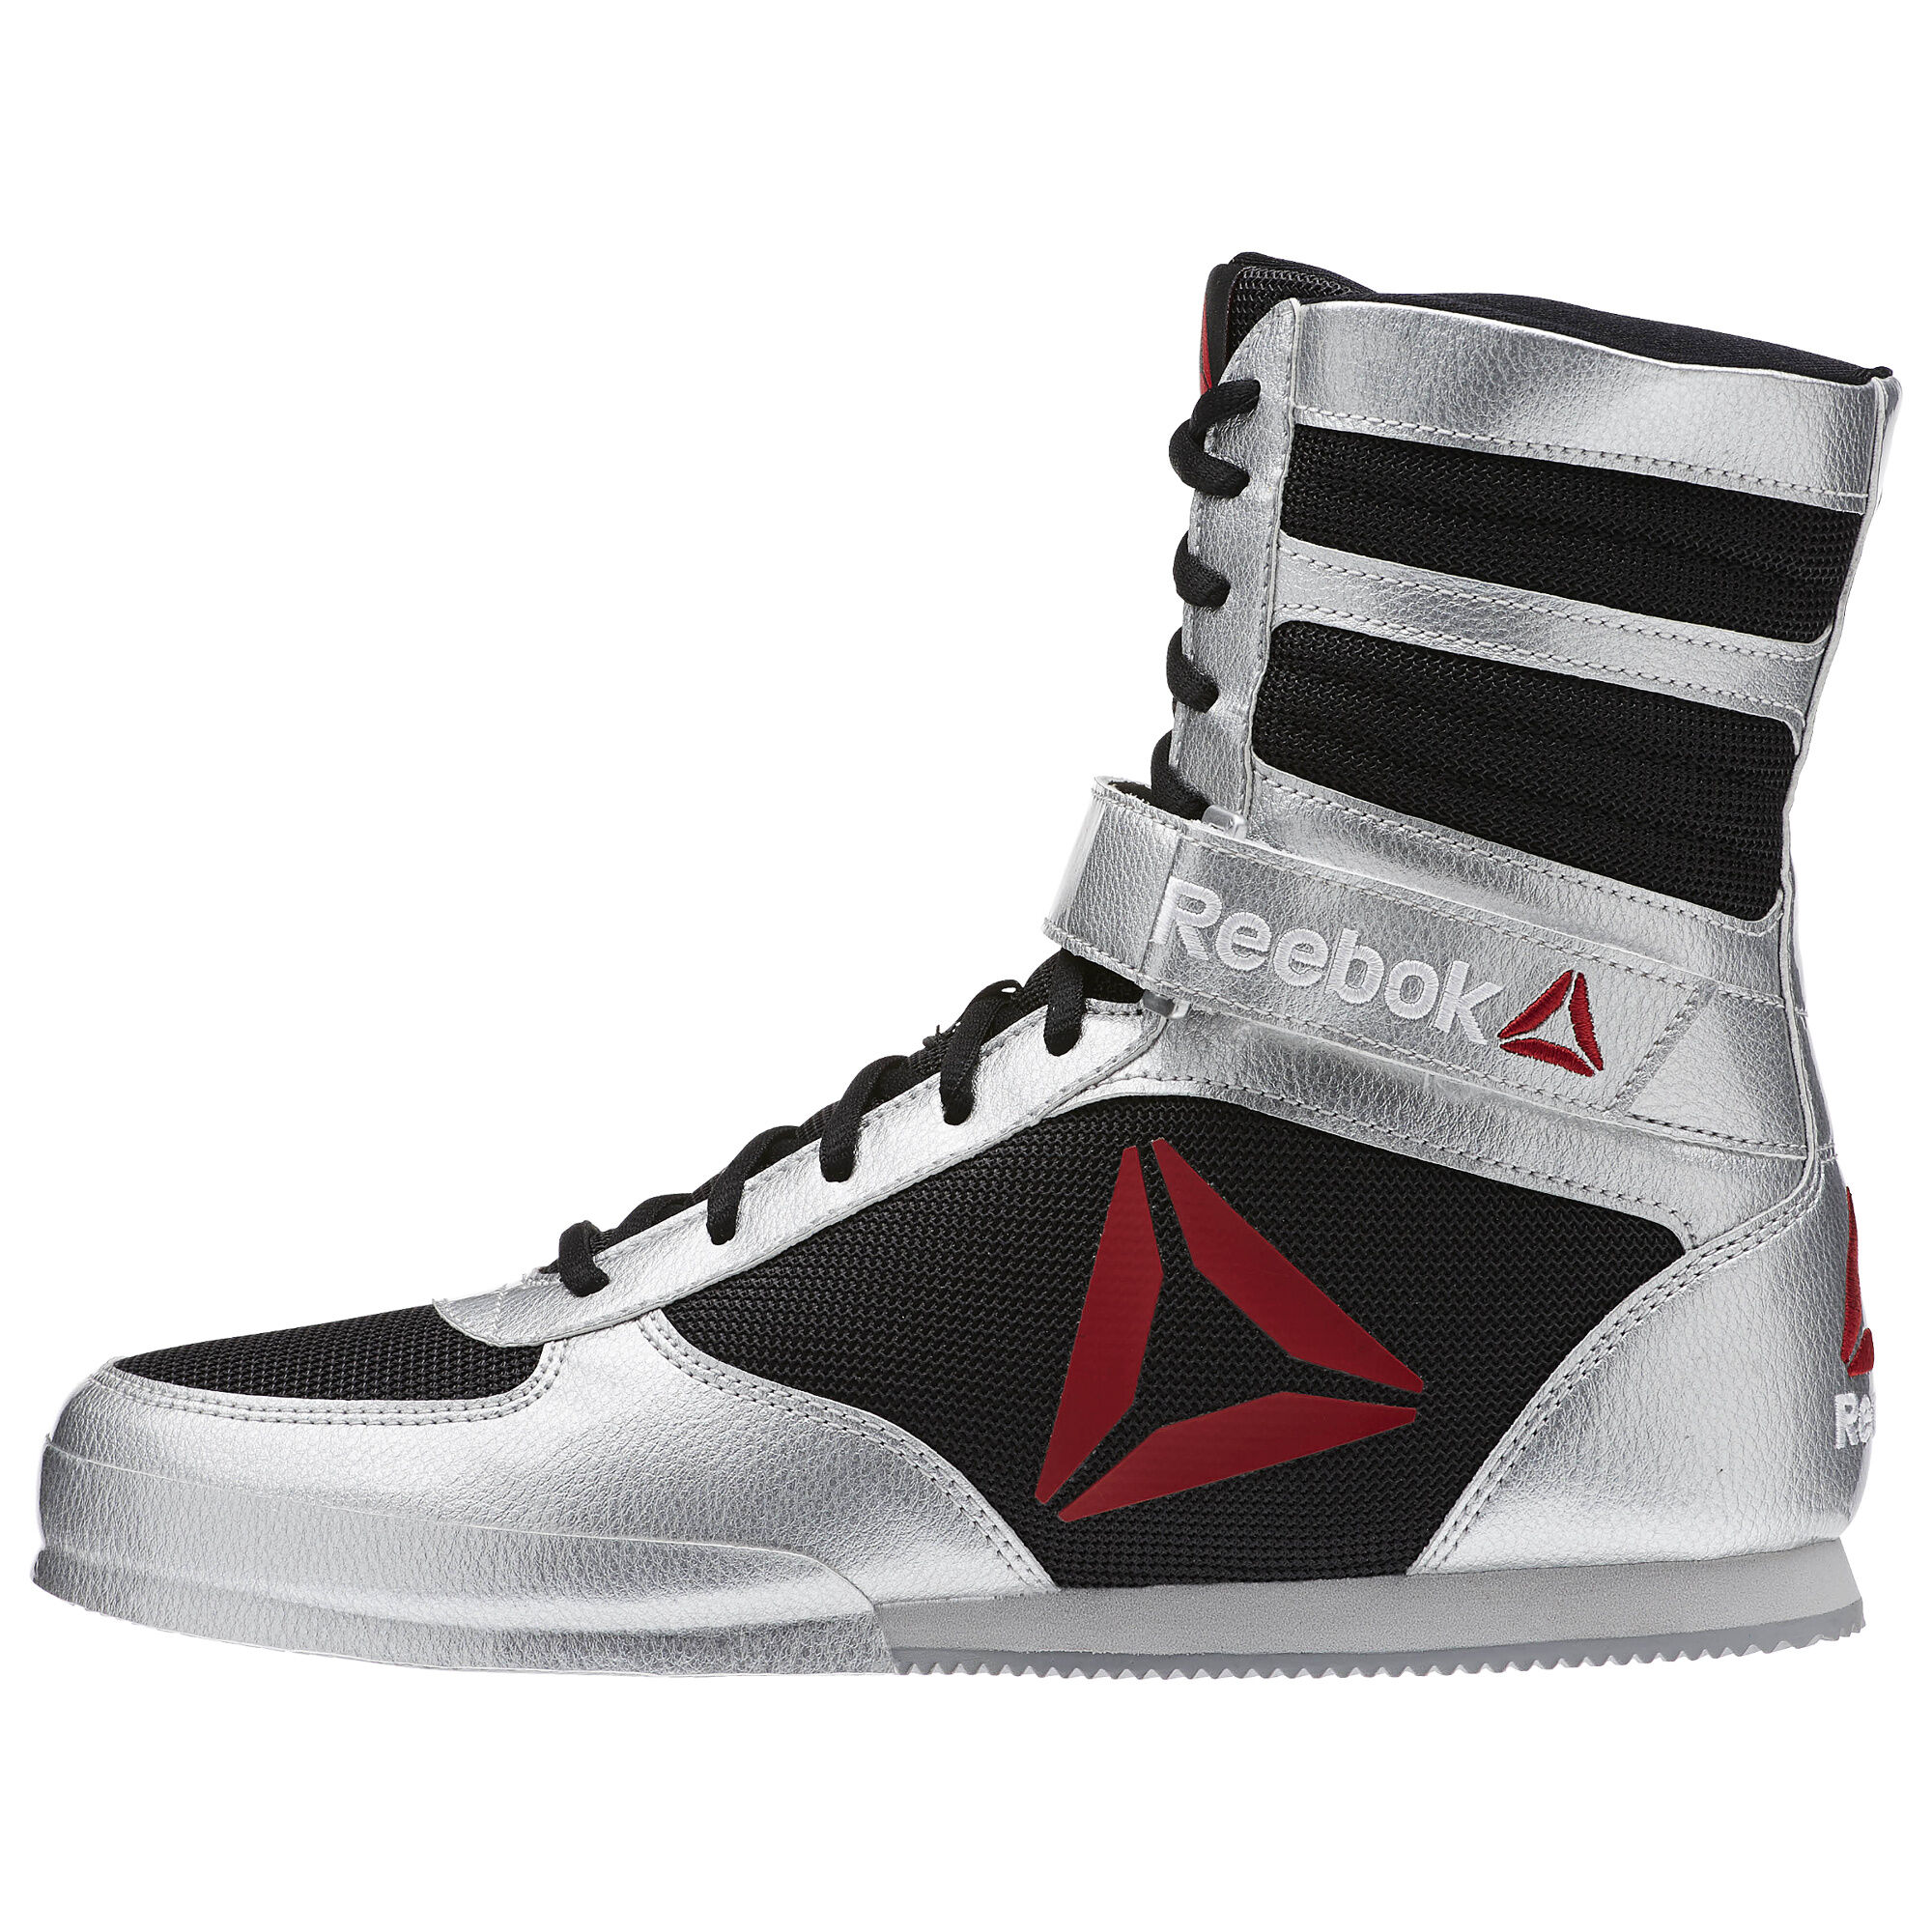 Boot Ebay Zapatos Reebok Pat Hombre Boxeo tzqwqp